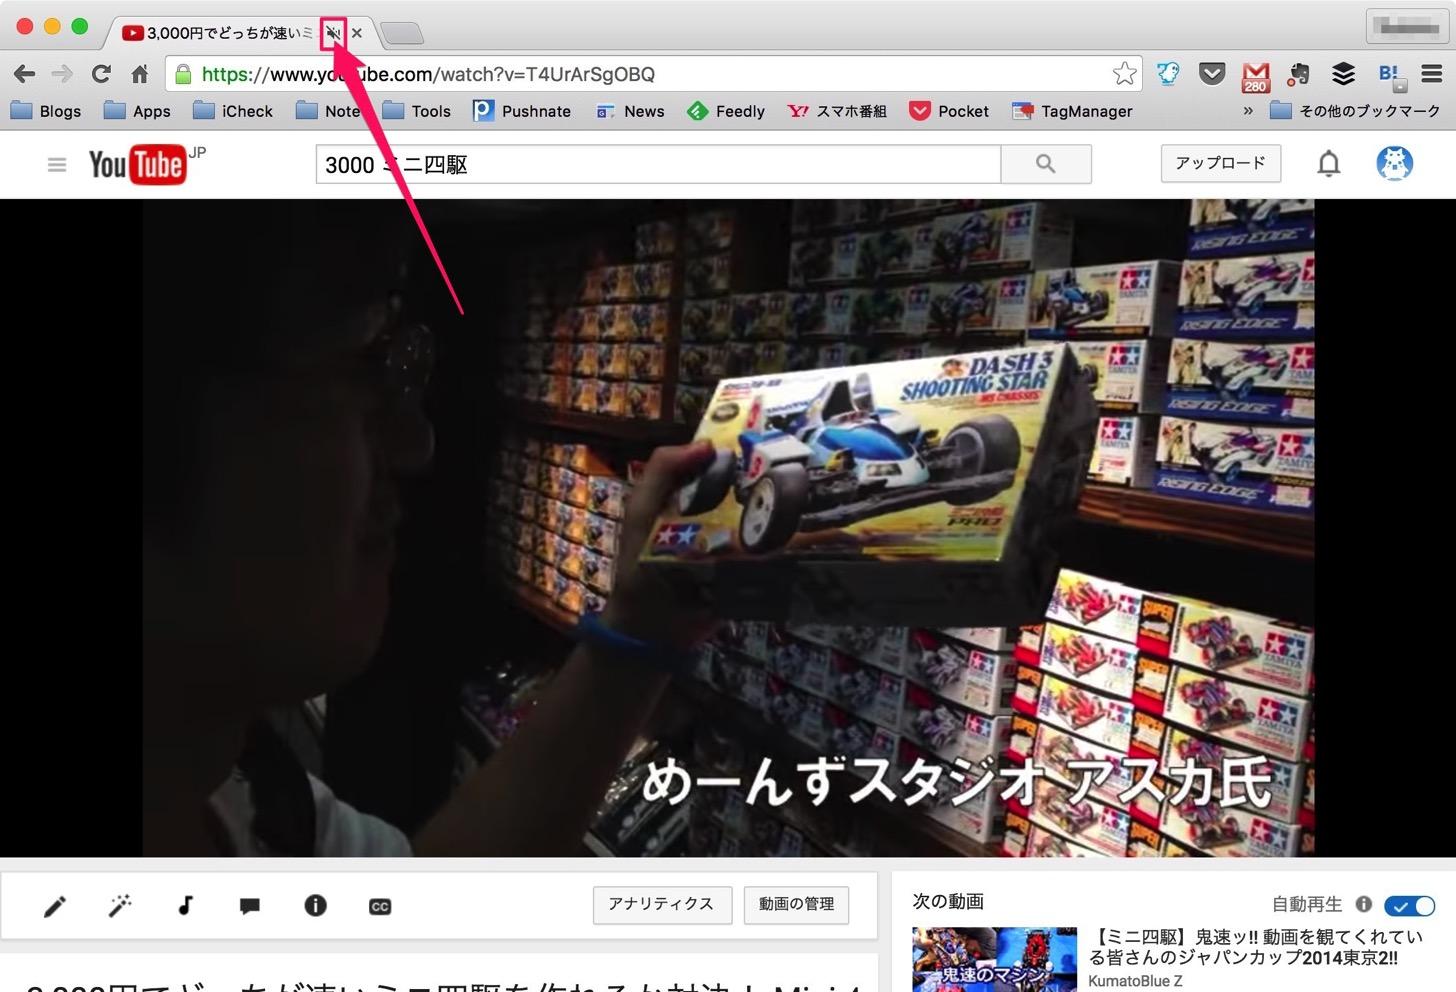 Chromeでタブから動画の音量をミュートにする方法。